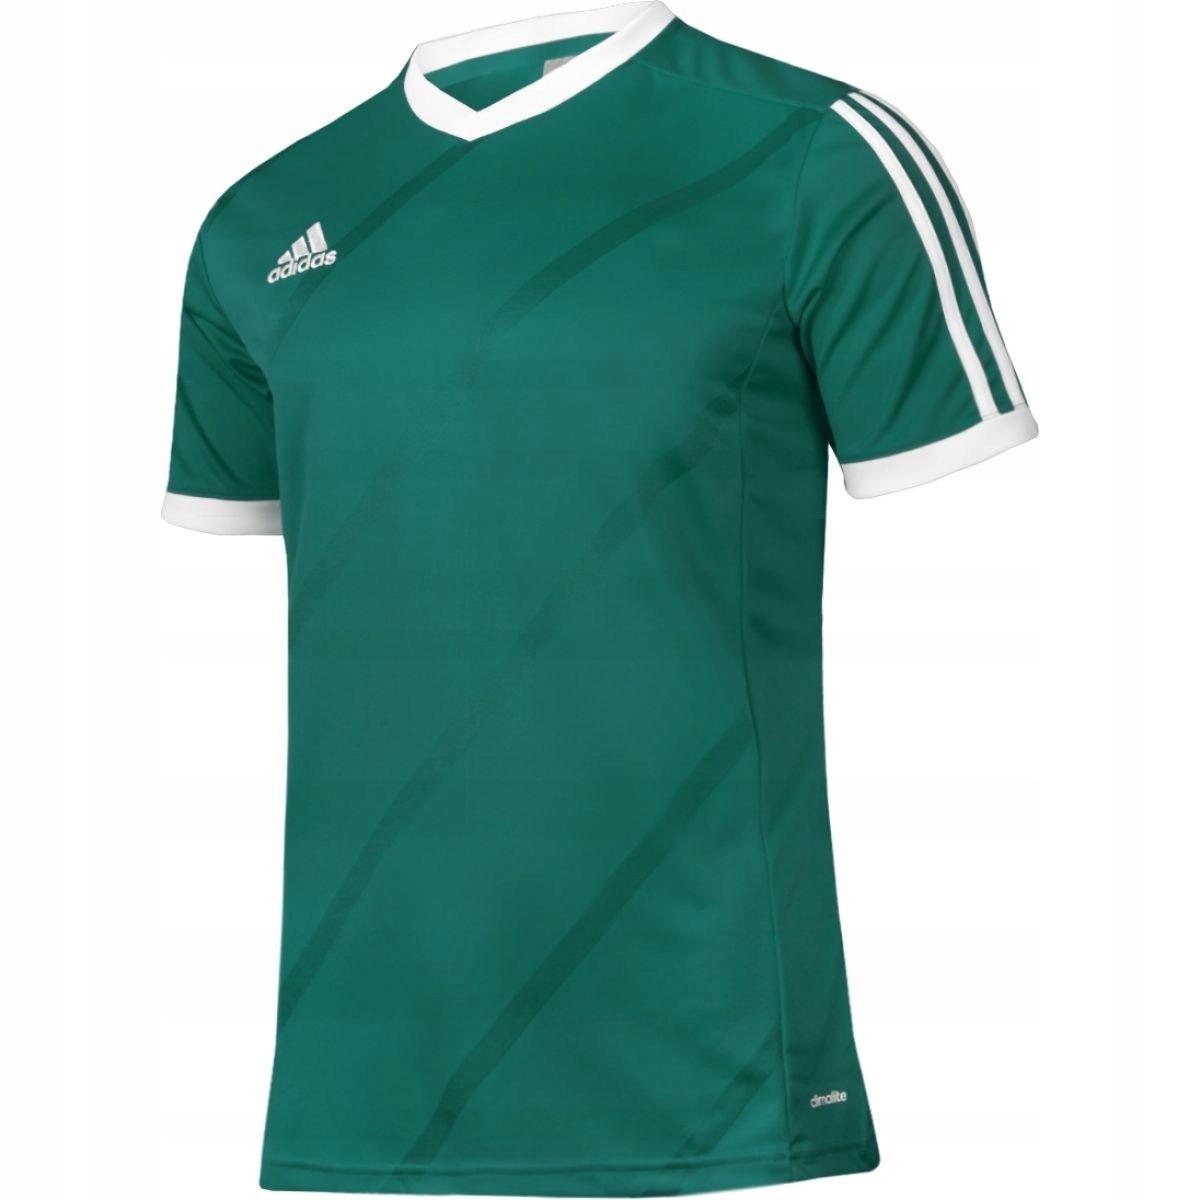 baafd6ae26410 Koszulka piłkarska adidas Tabela 14 Junior F8 152 - 7488685206 ...